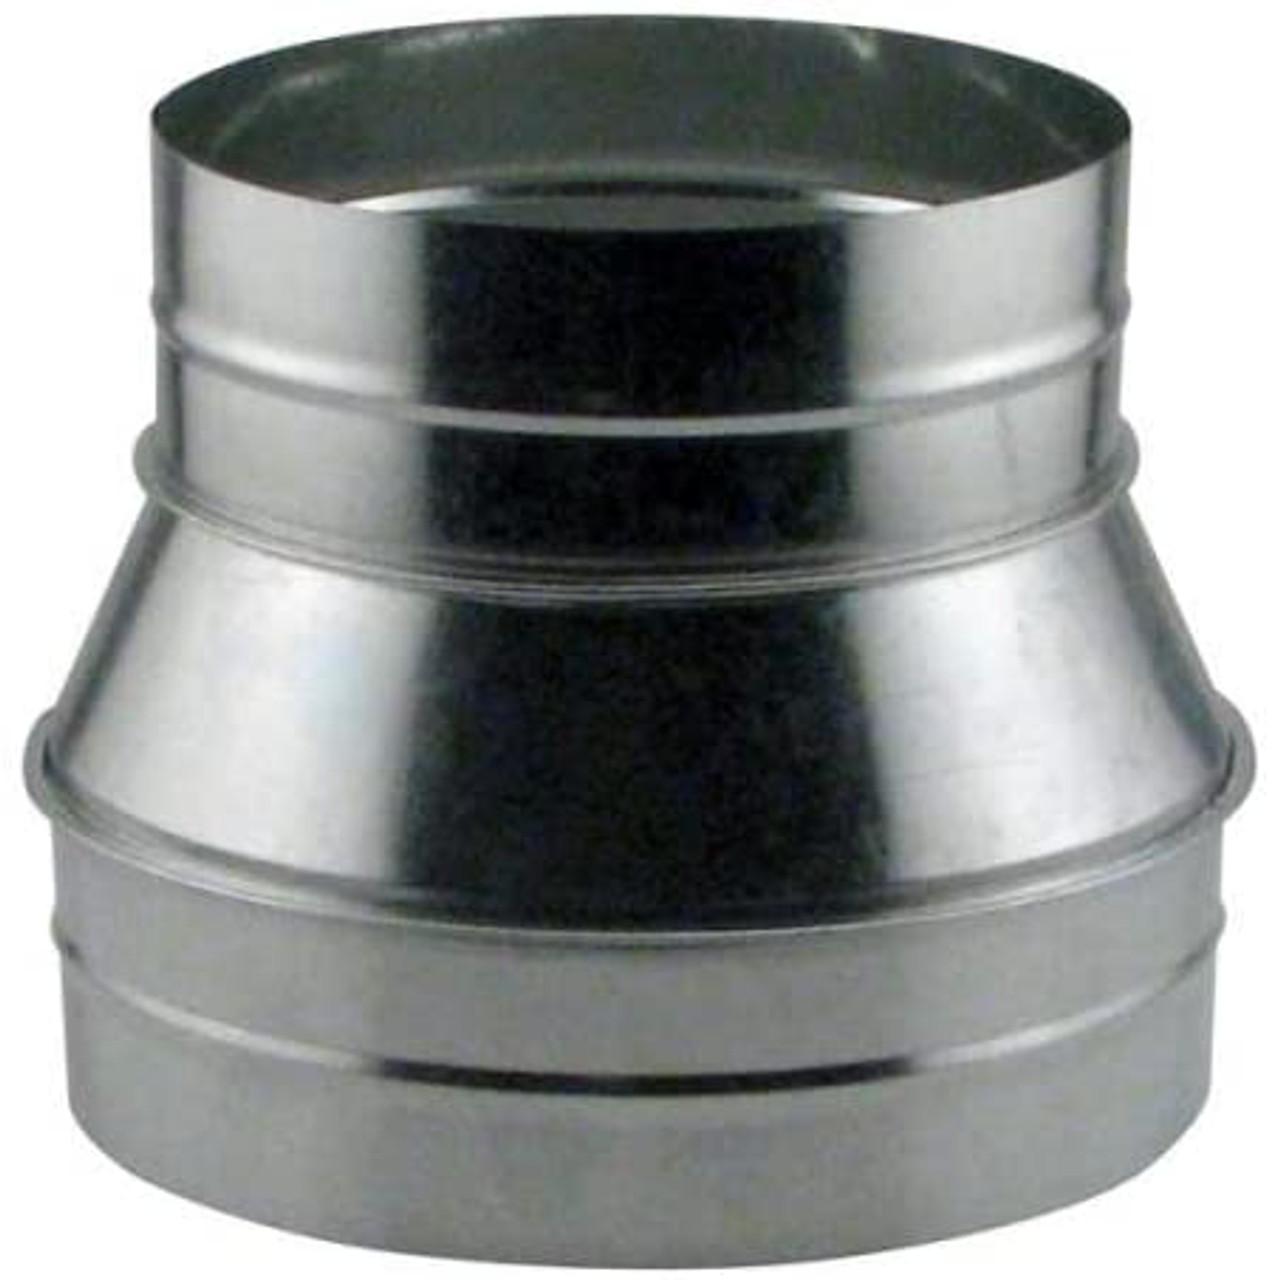 10x8 flex duct reducer